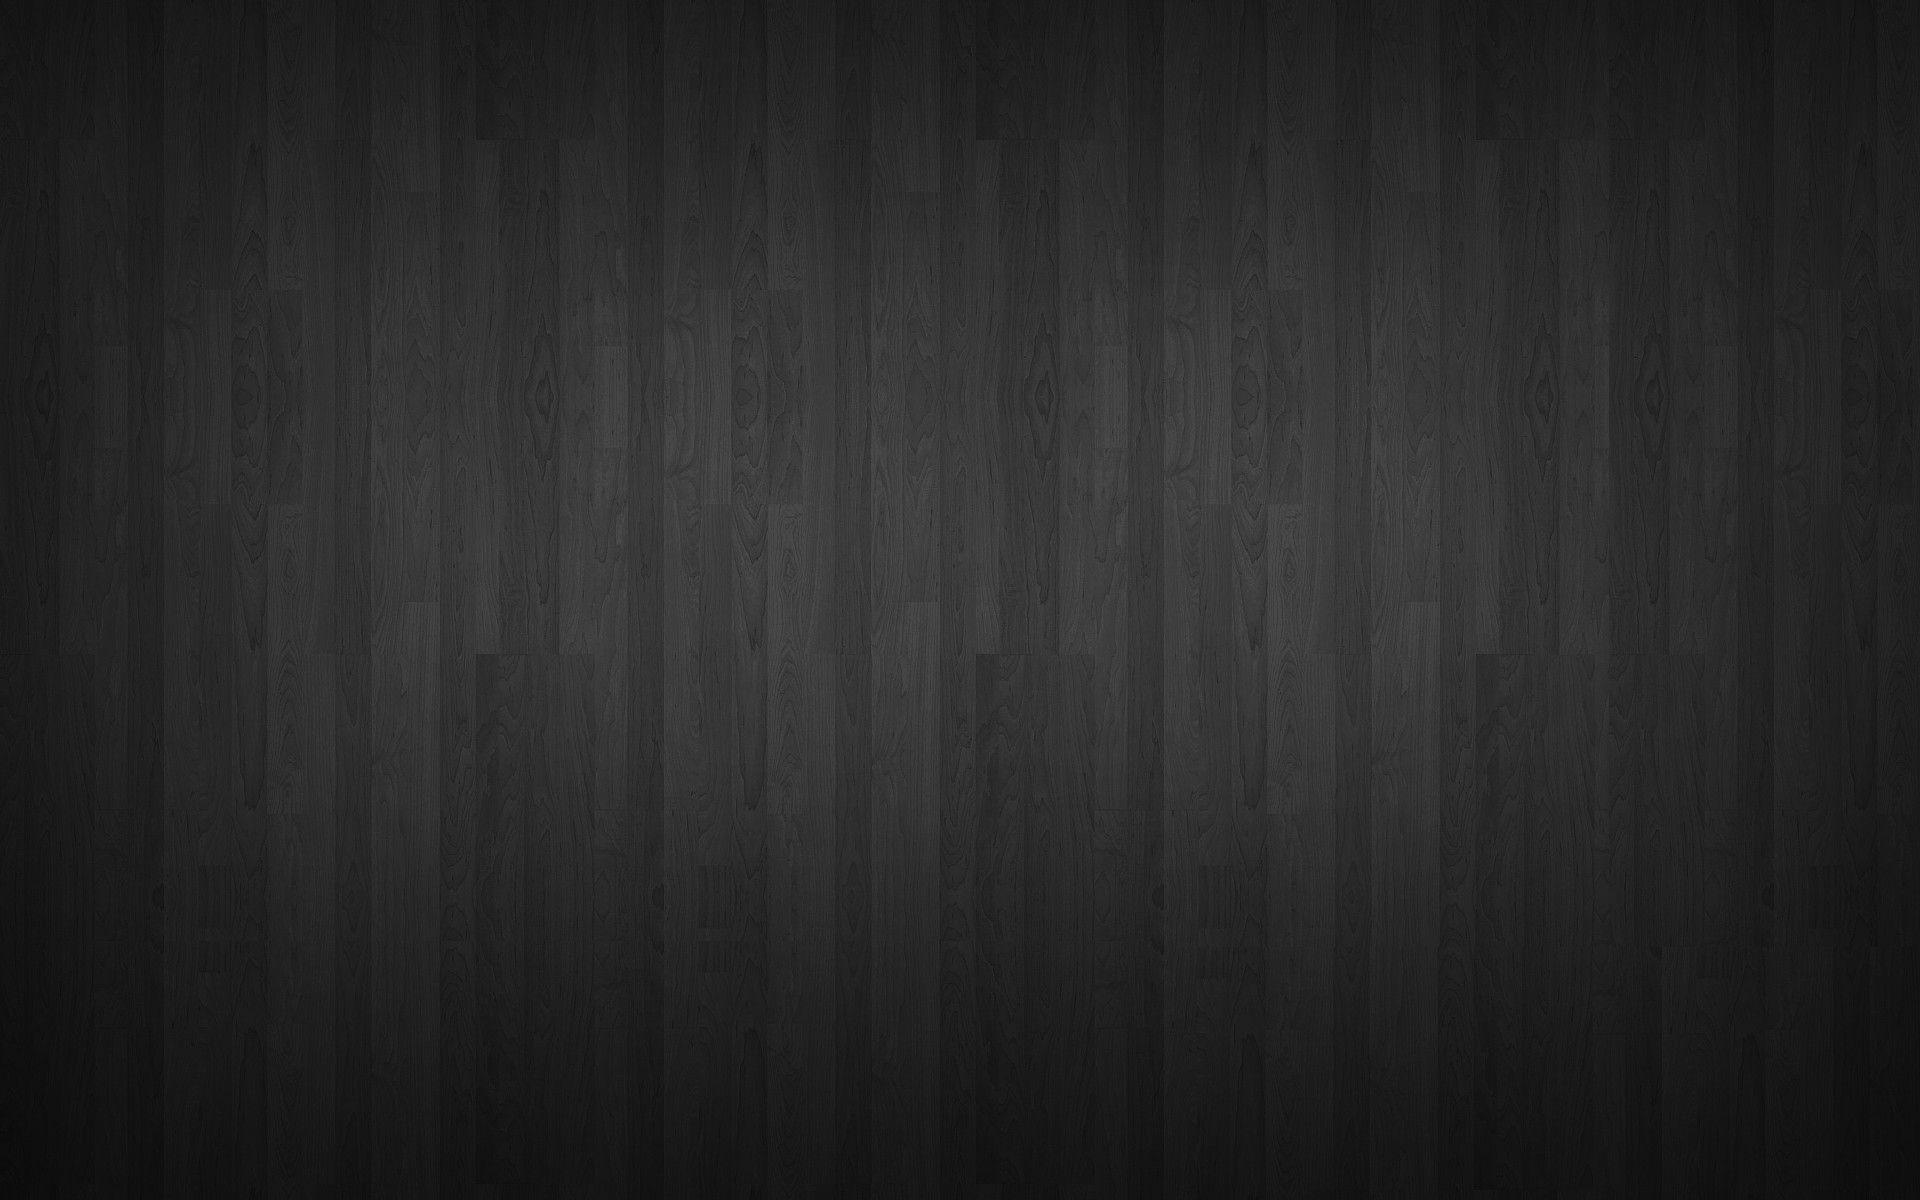 Cool-Plain-Backgrounds-wallpaper-wpc5803702